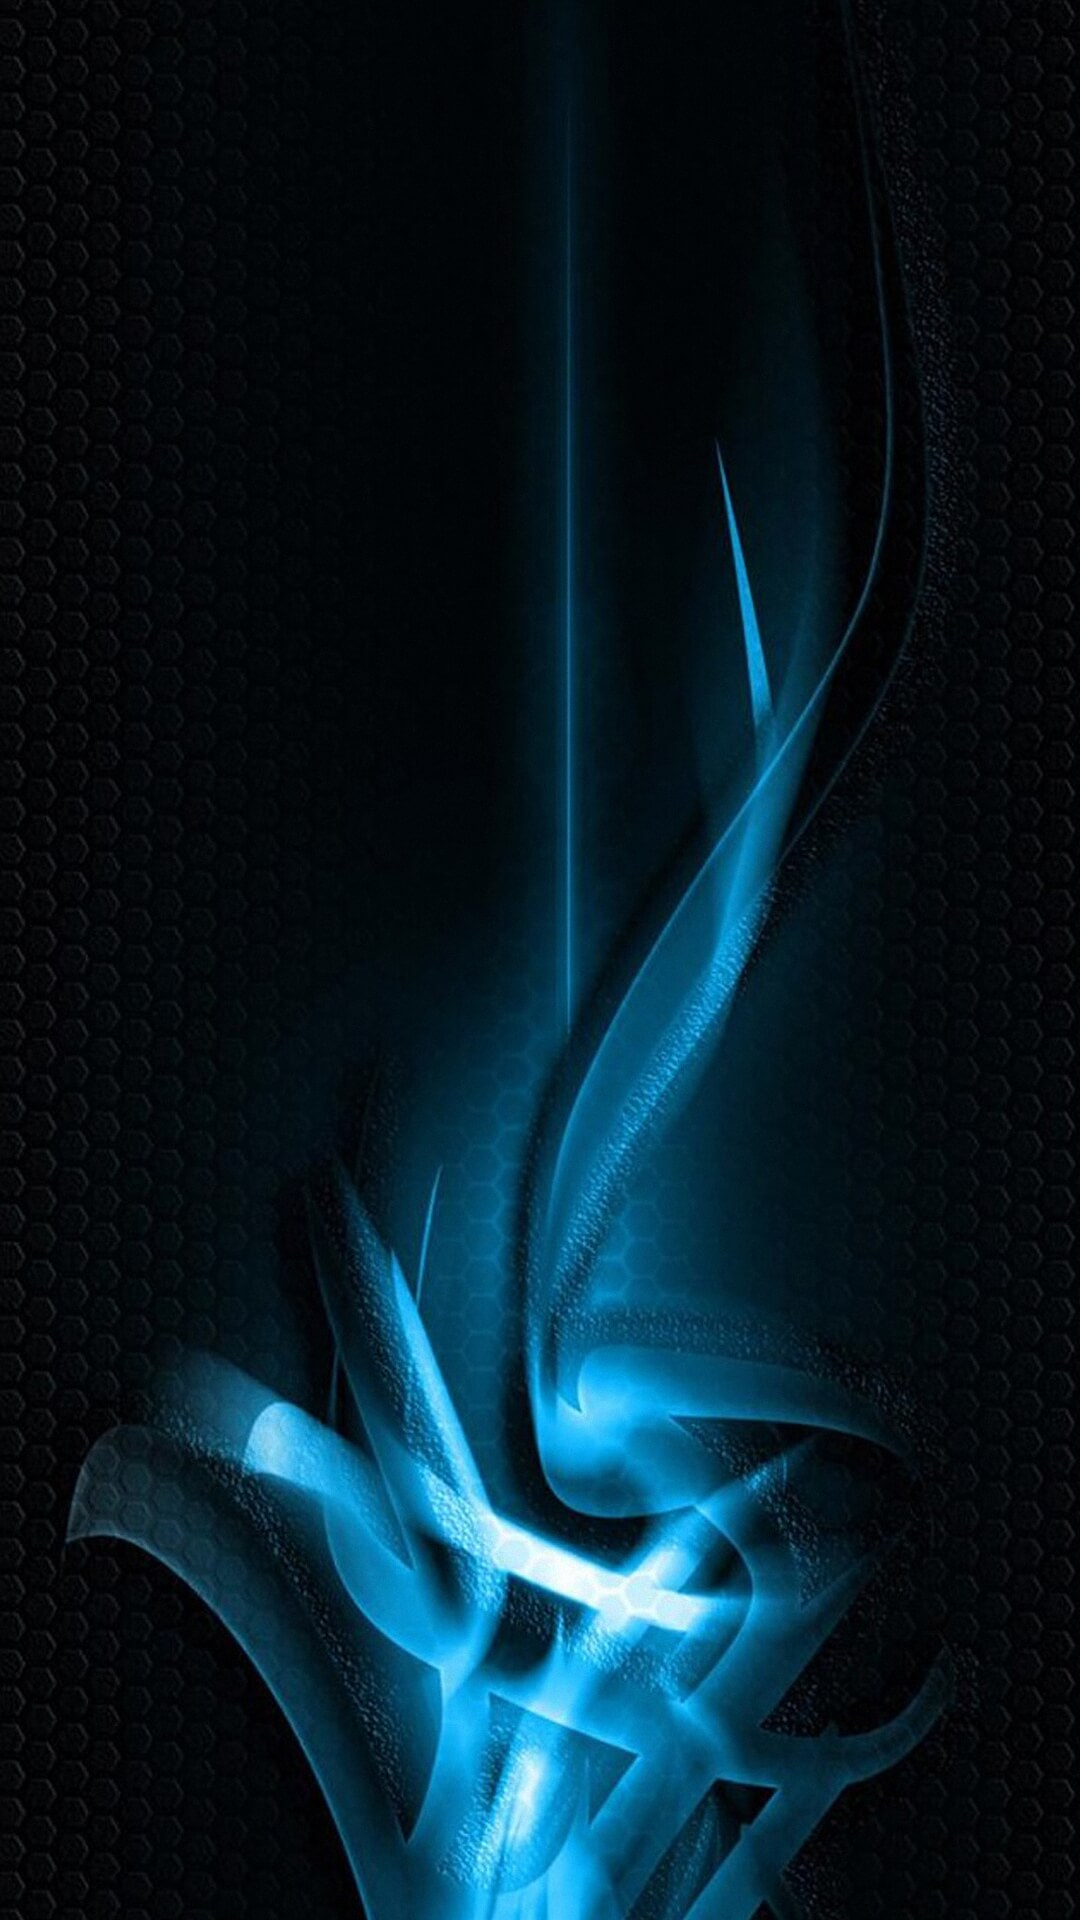 Samsung Galaxy S Wallpaper Hd